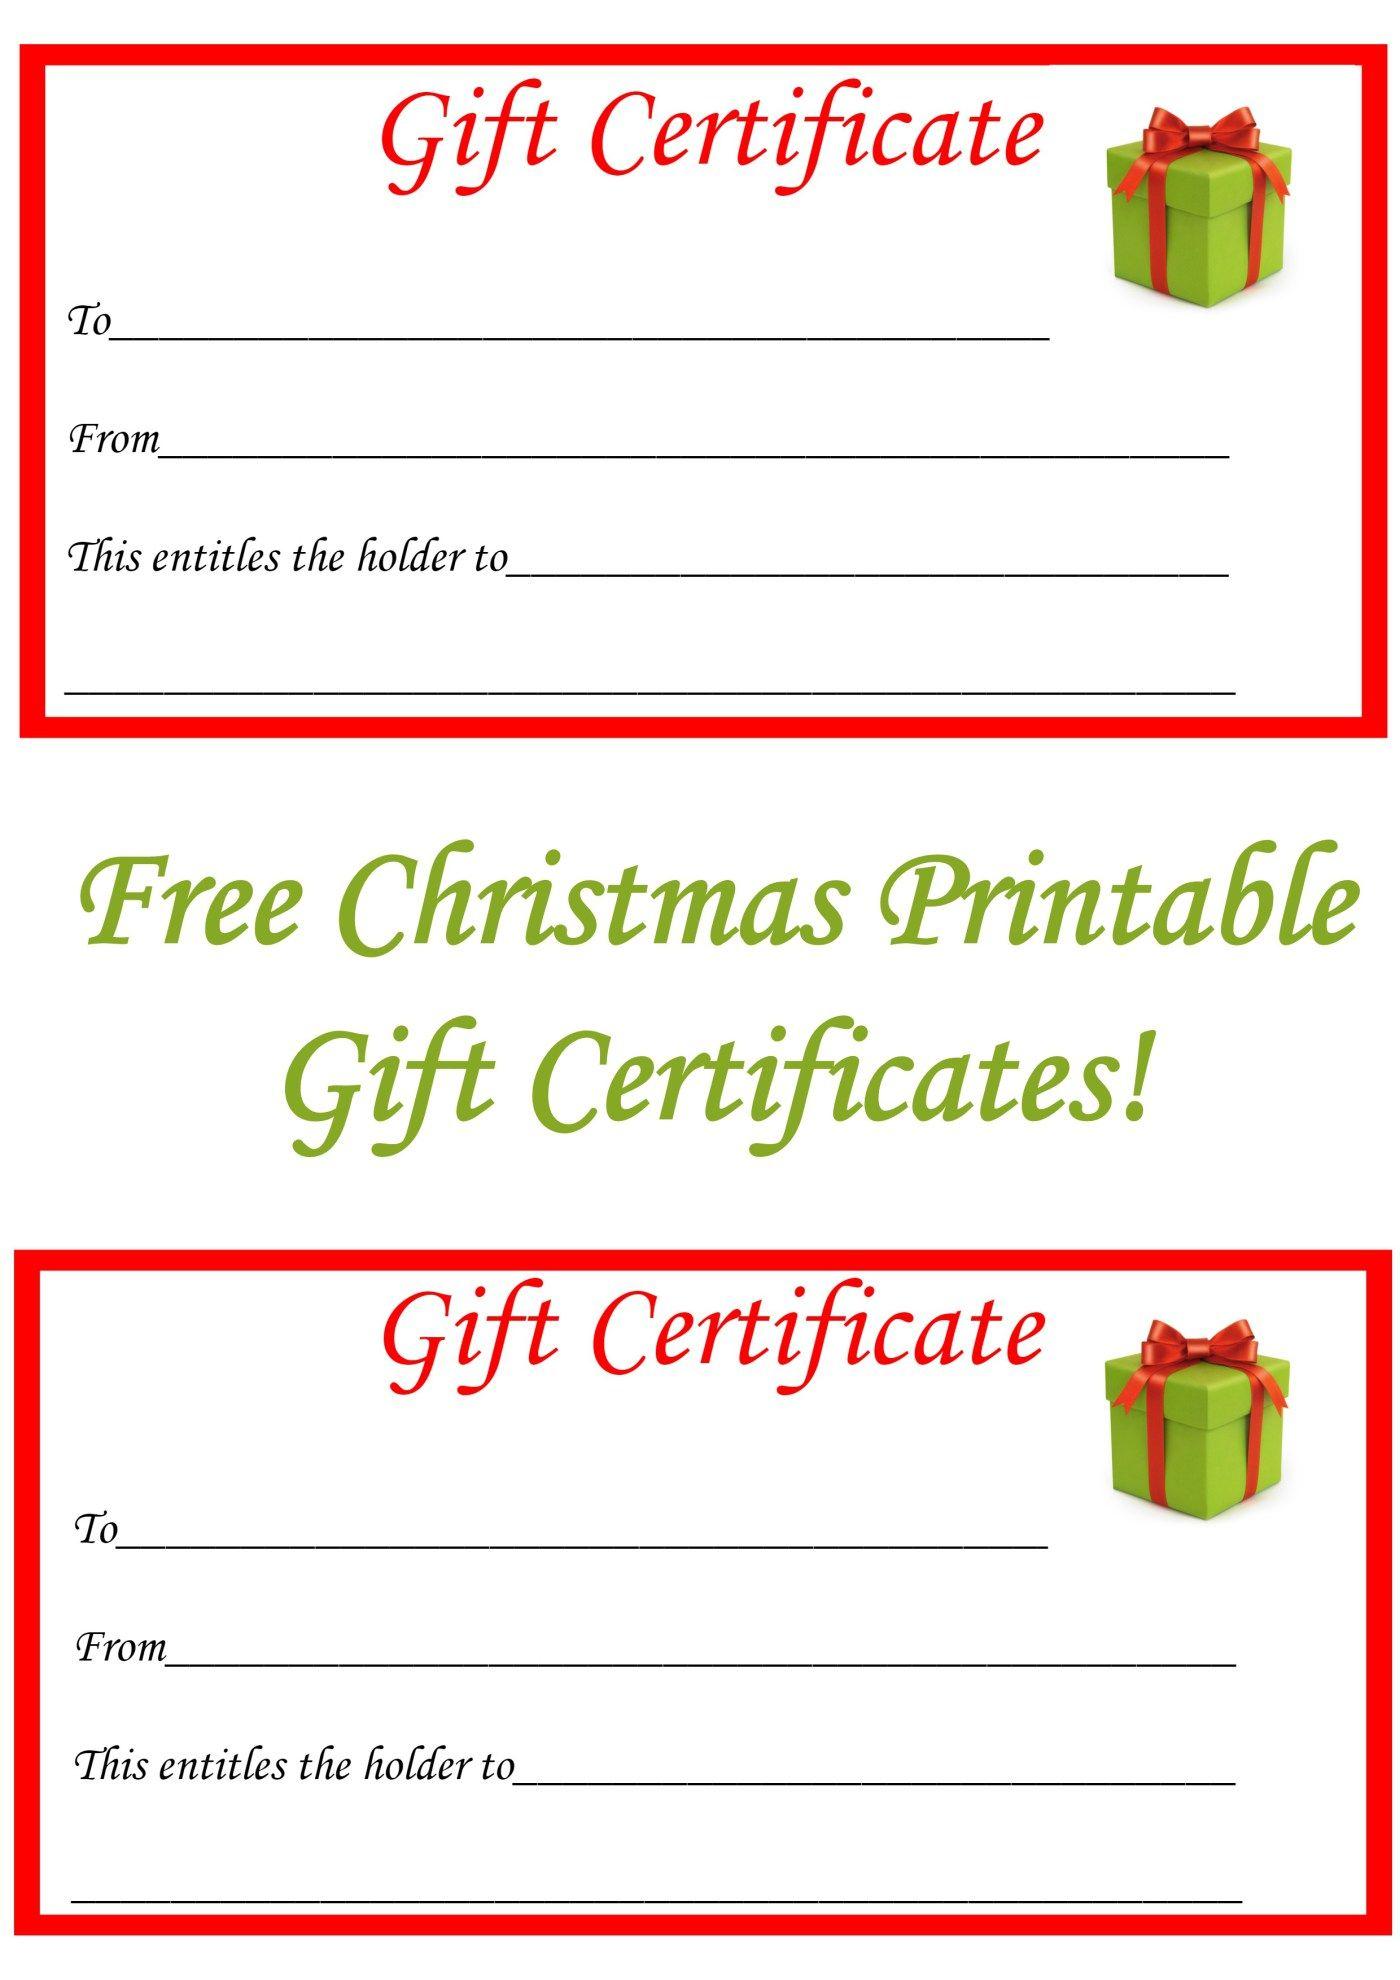 Free Christmas Printable Gift Certificates | Free christmas gifts ...